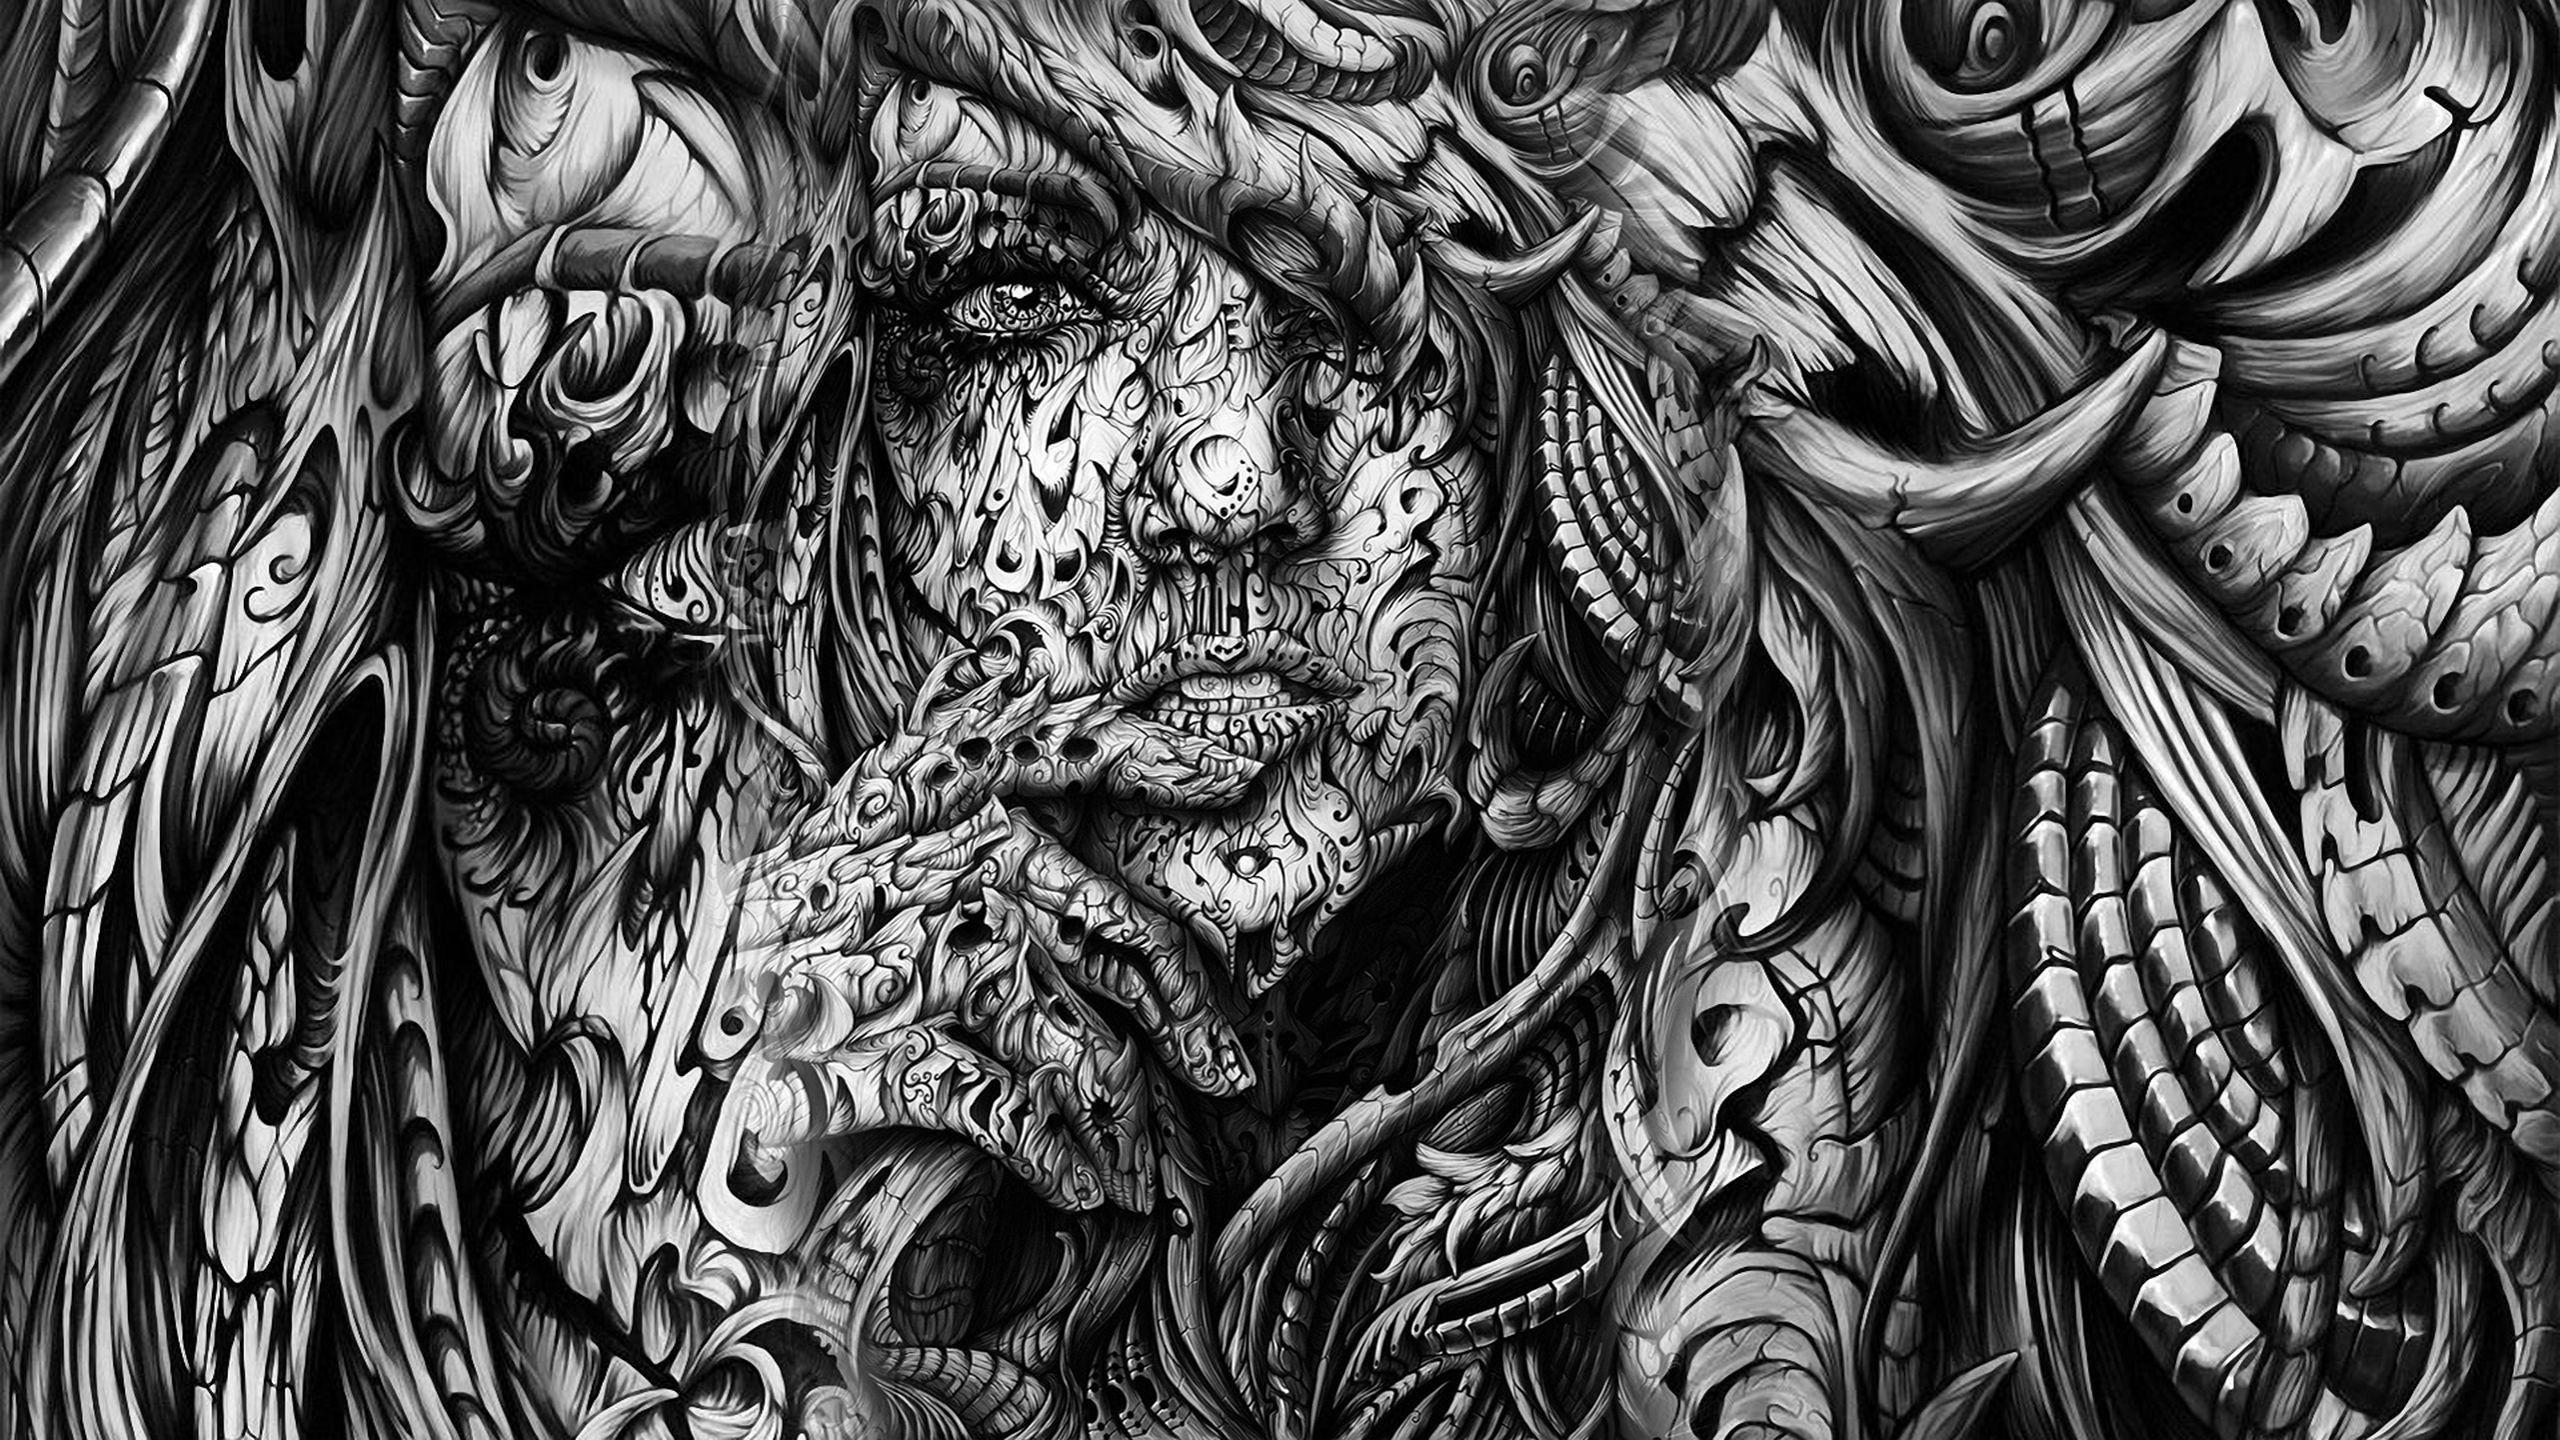 abstract-3d-black-n-white-   art and design   pinterest